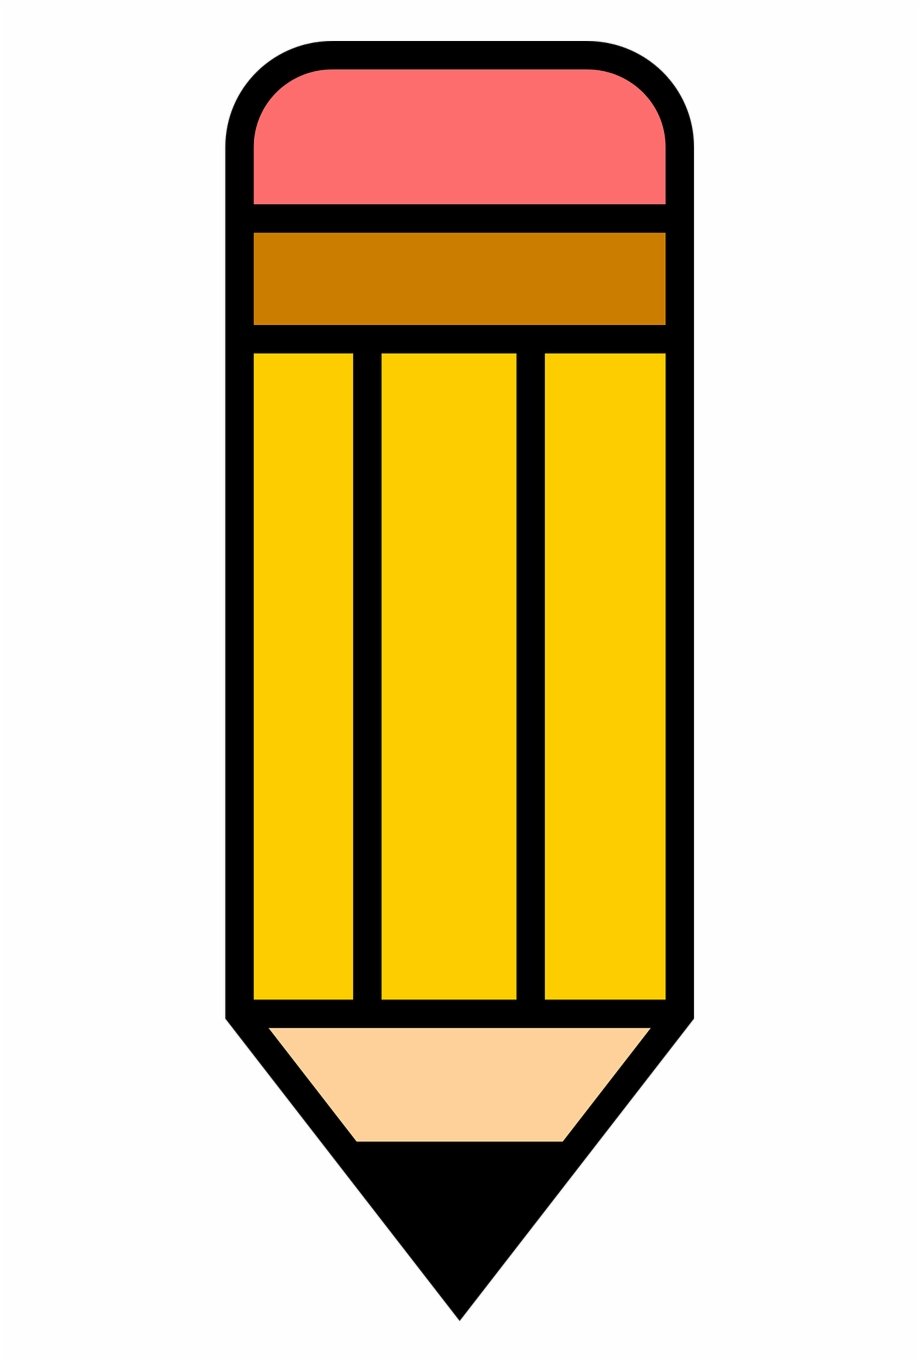 Icon Pencil Write Edit Draw Png Image.